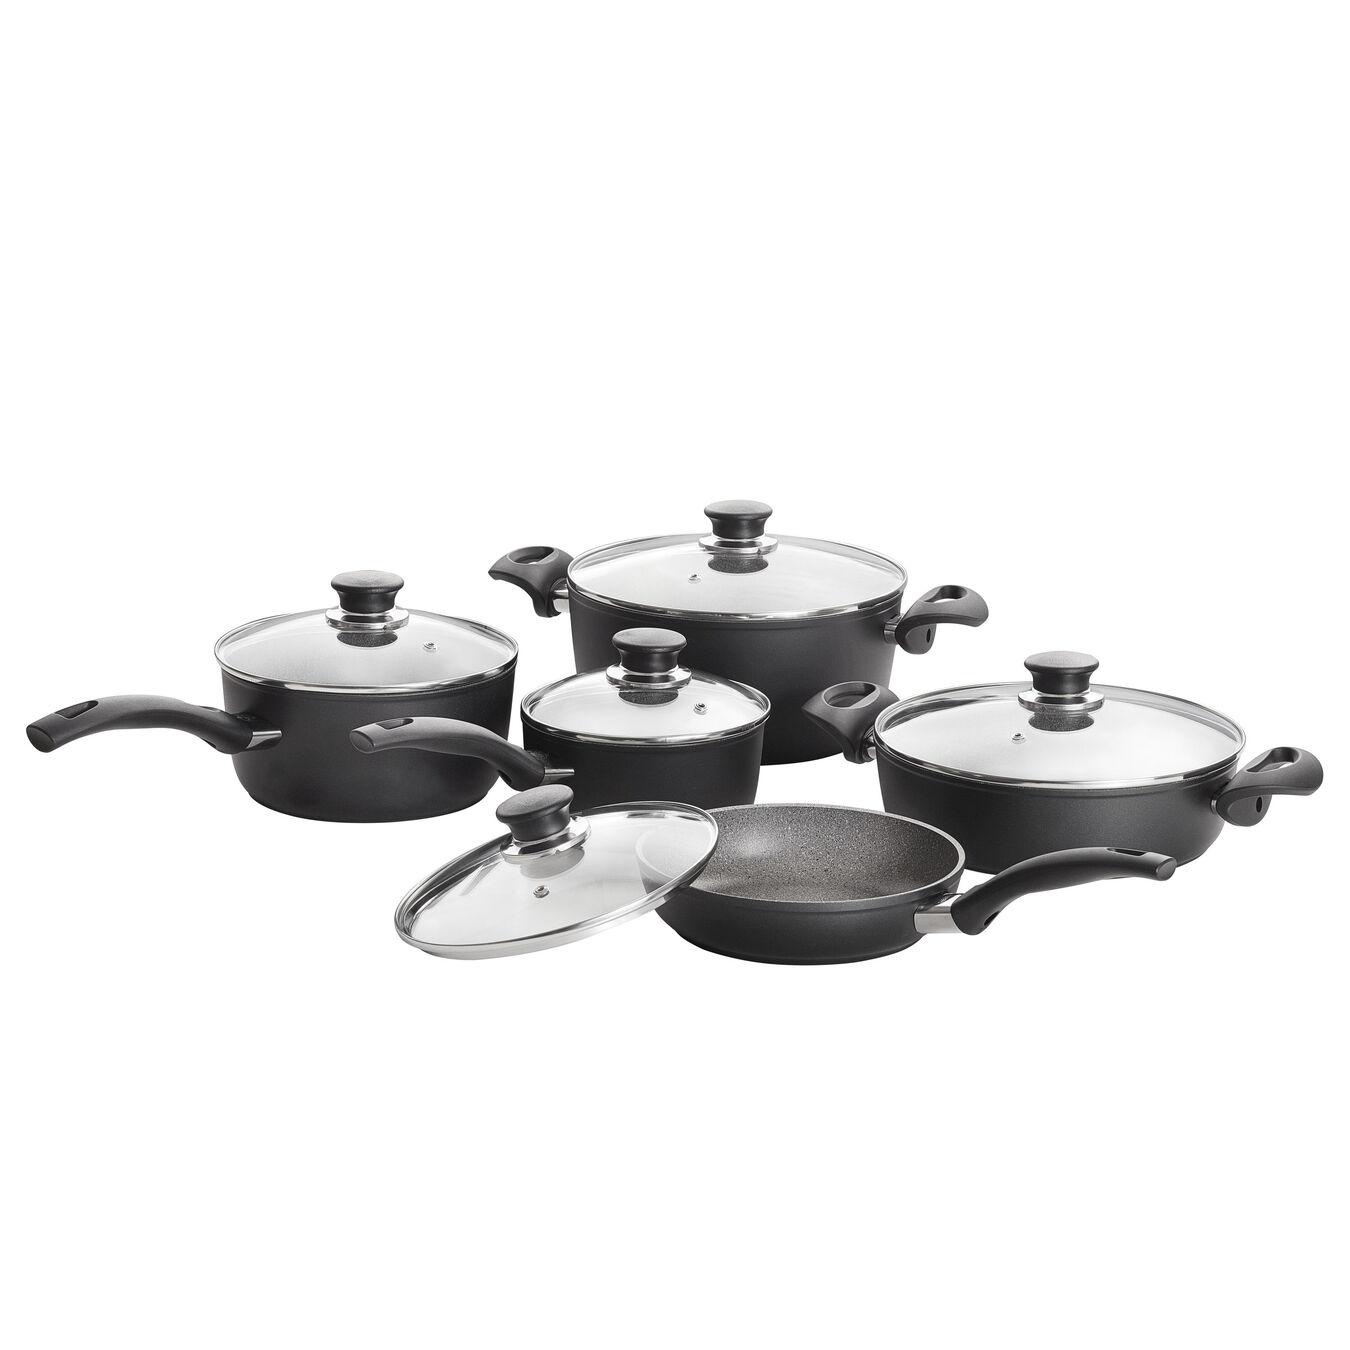 10 Piece Aluminum Cookware set,,large 1